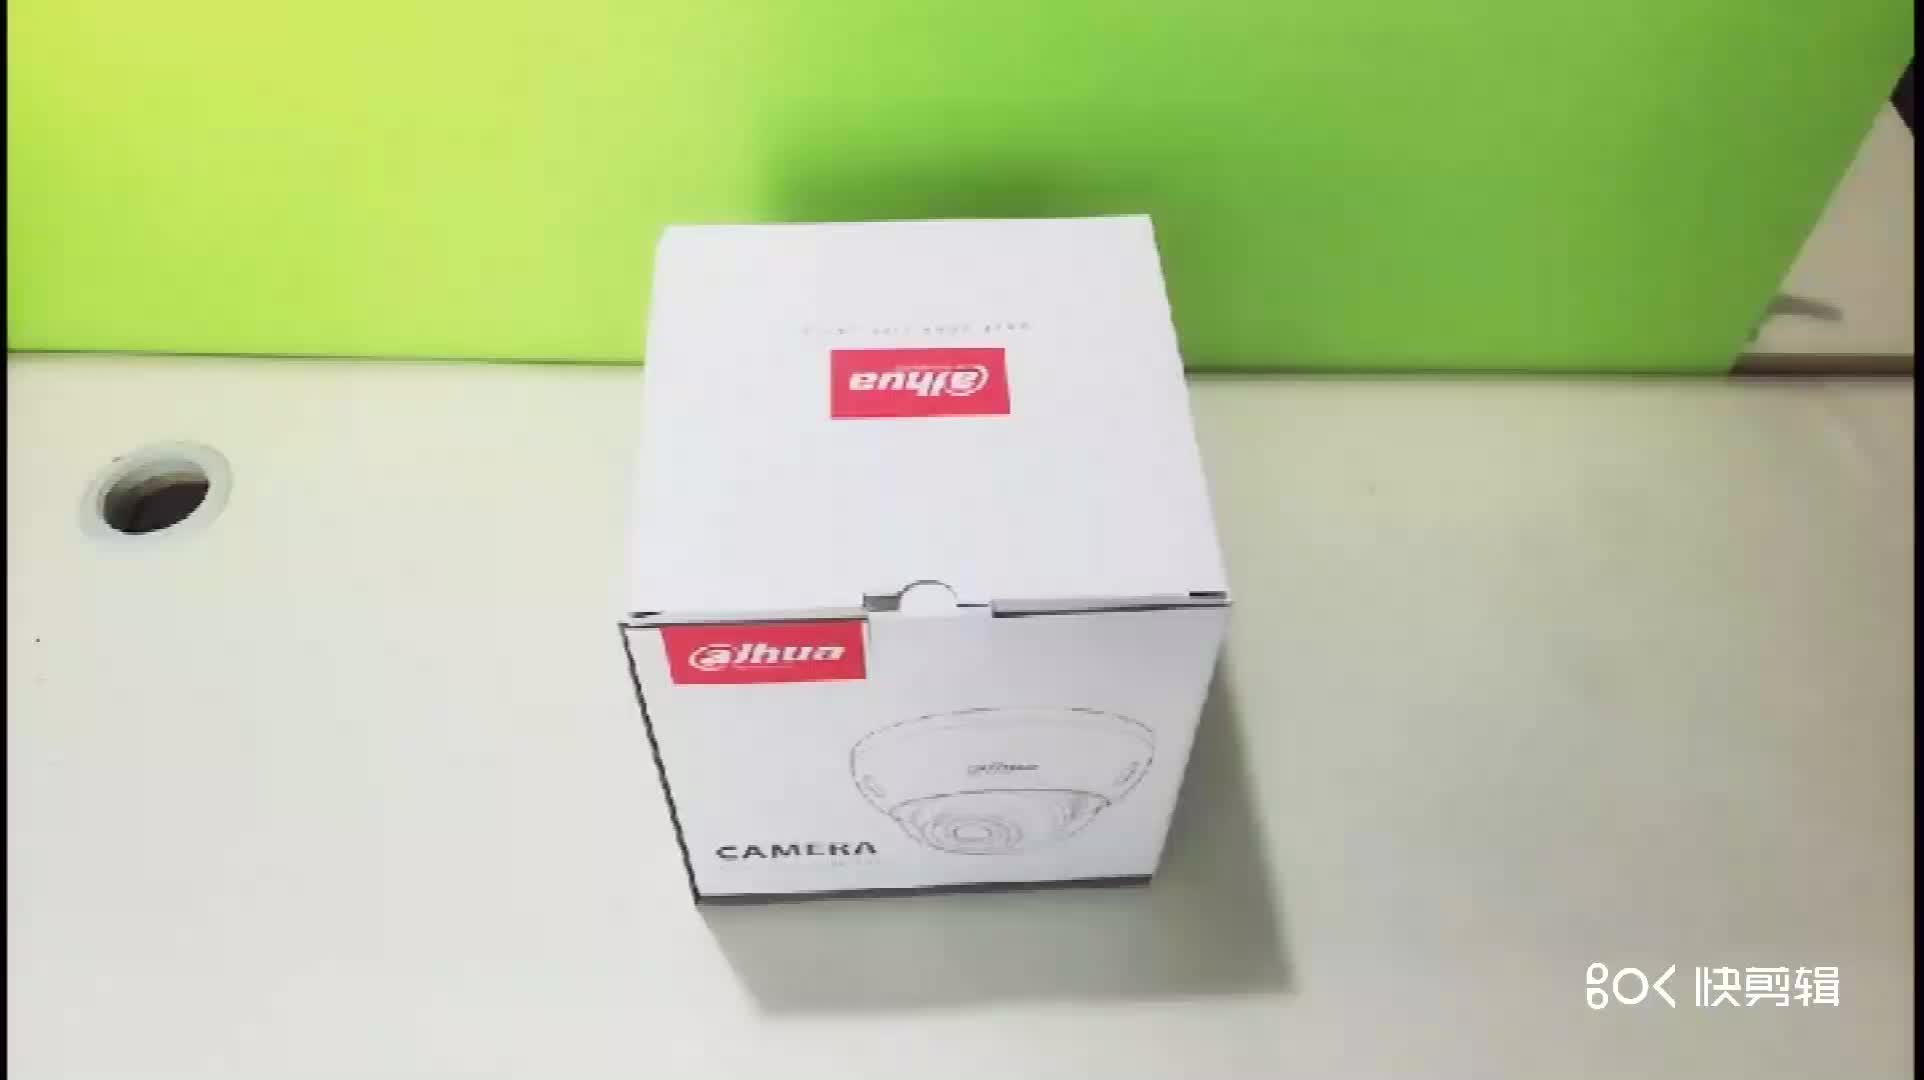 Dahua cámara IP IPC-HDBW2231R-ZS-S2 2MP WDR IR domo de red starlight versión mejorada IPC-HDBW2231R-ZS cámara ip POE